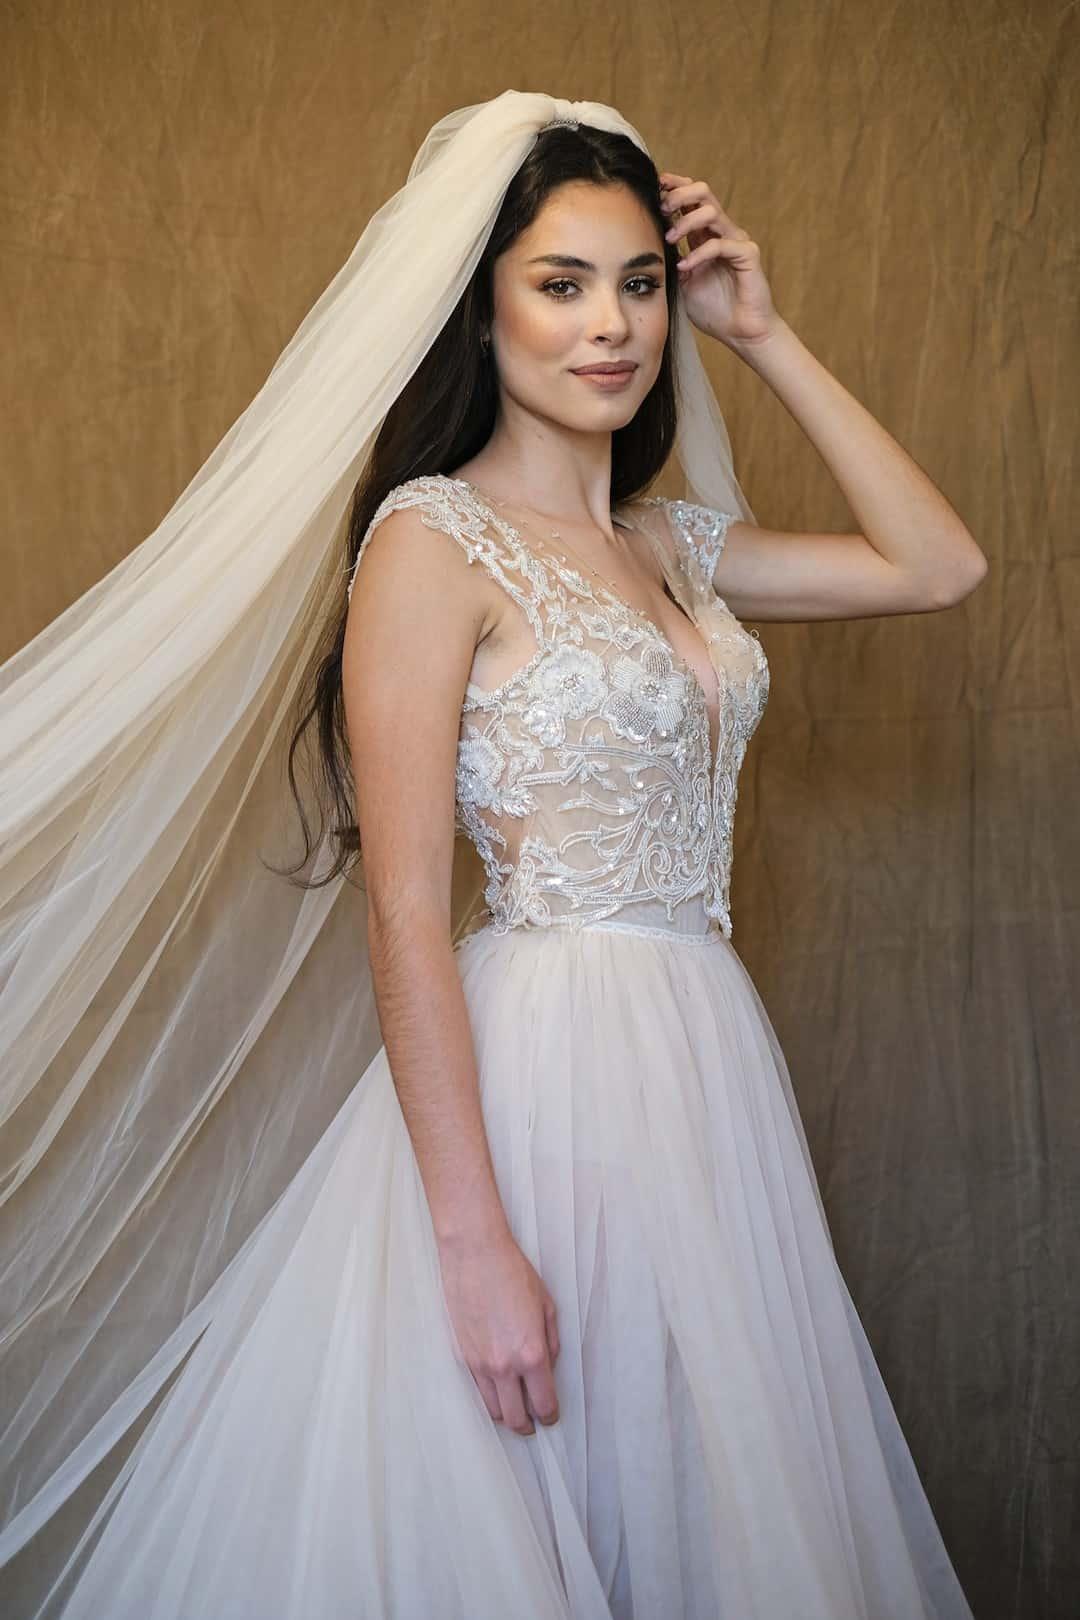 Wedding dresses on sale in Bratislava - Galia Lahav - Gala 607 - front_top